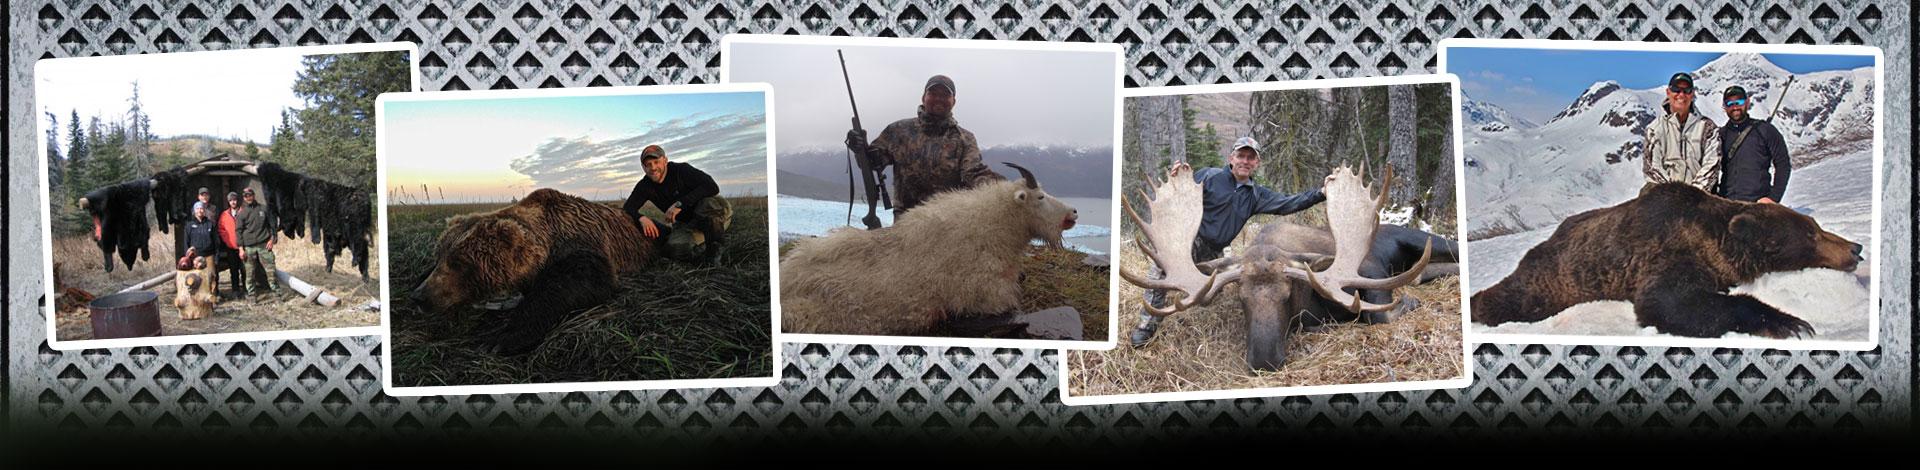 Alaska unit 14c trophy sheep hunt home unit 14c trophy dall sheep hunt sciox Choice Image